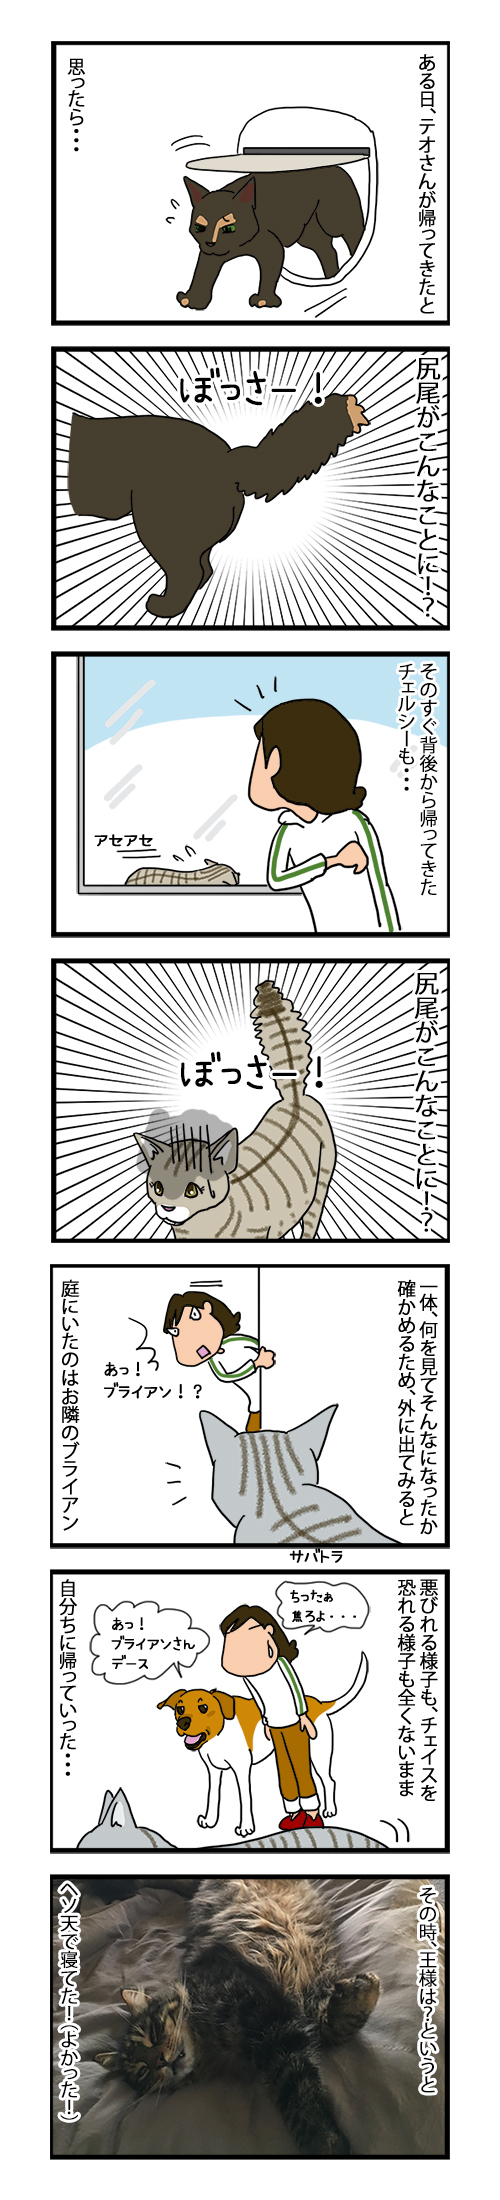 05082019_cat6koma.jpg